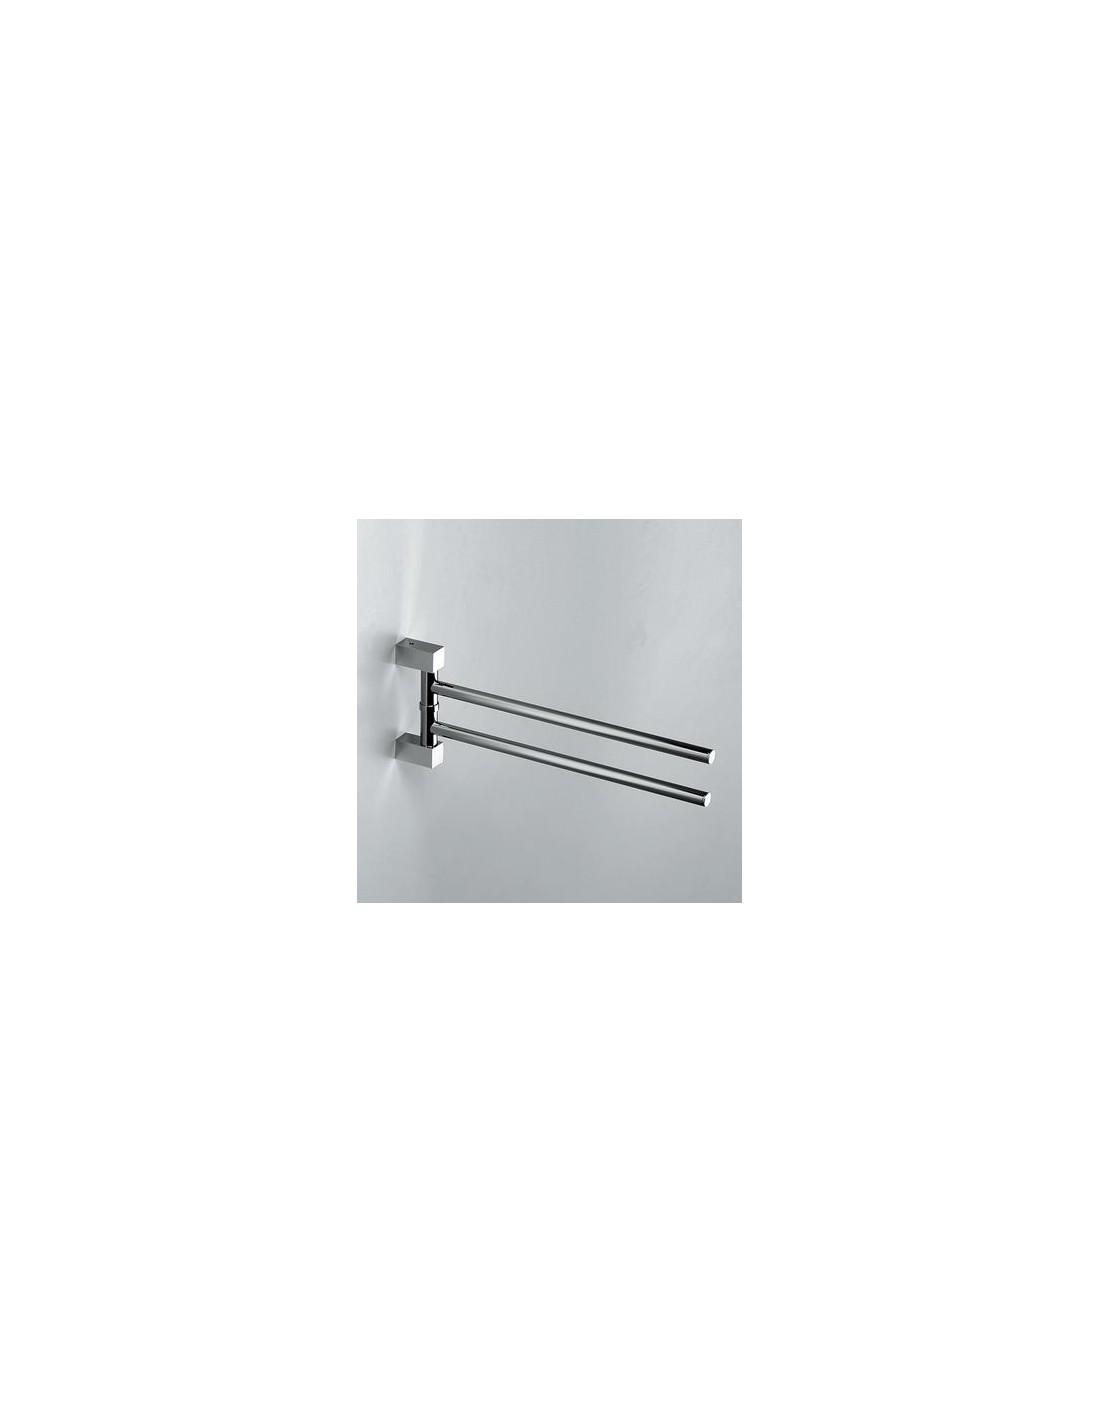 Porte serviettes double giratoire bloque for Porte serviette double